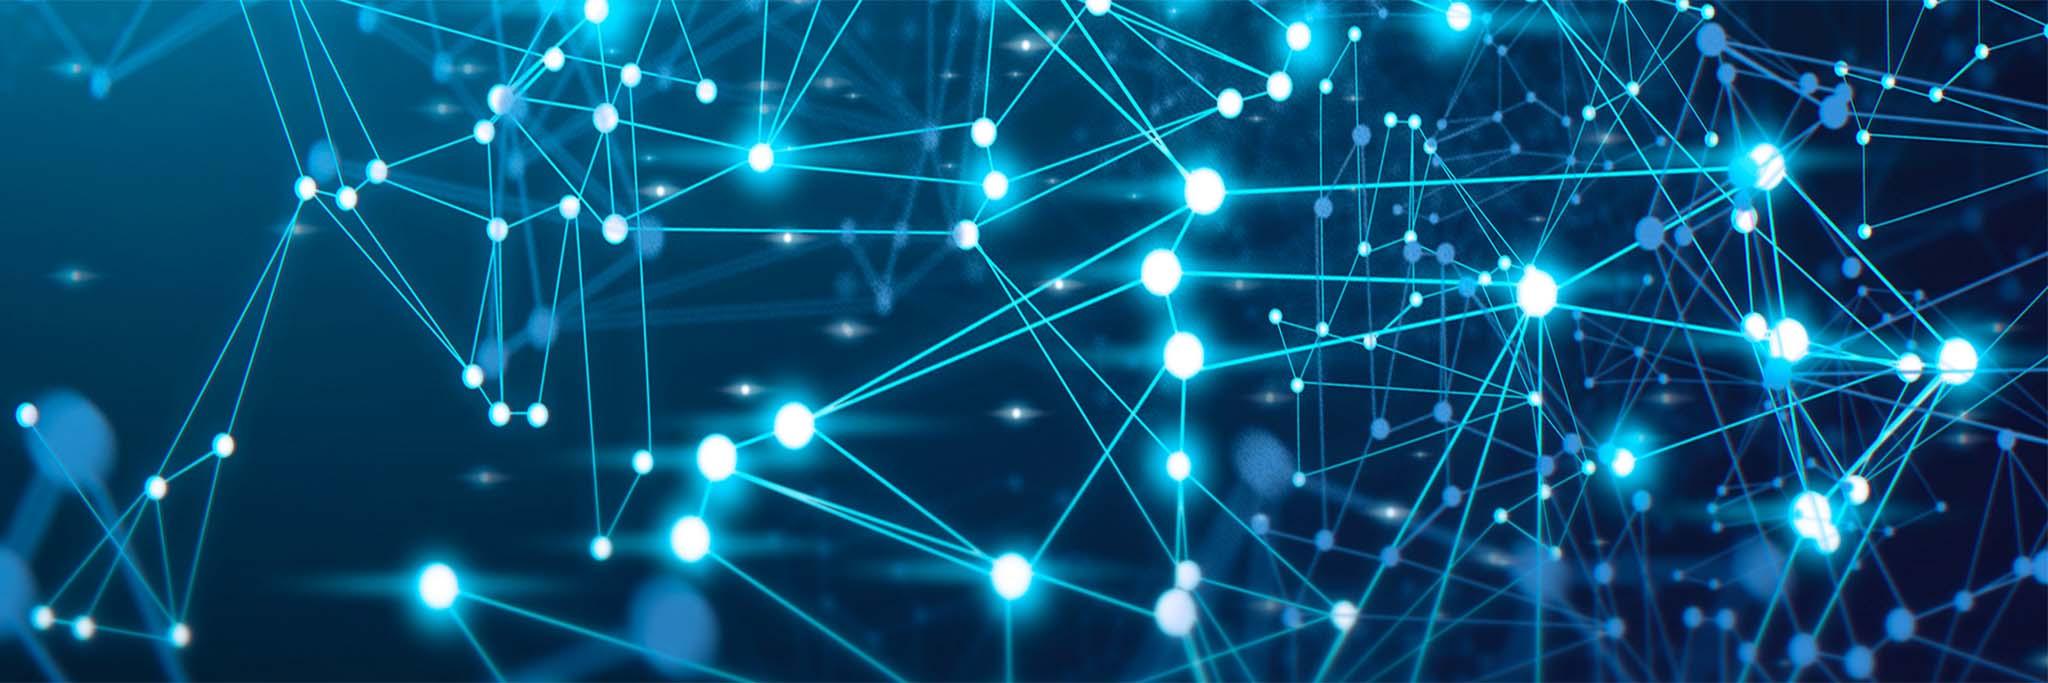 تجهیزات-شبکه-فیبر-نوری